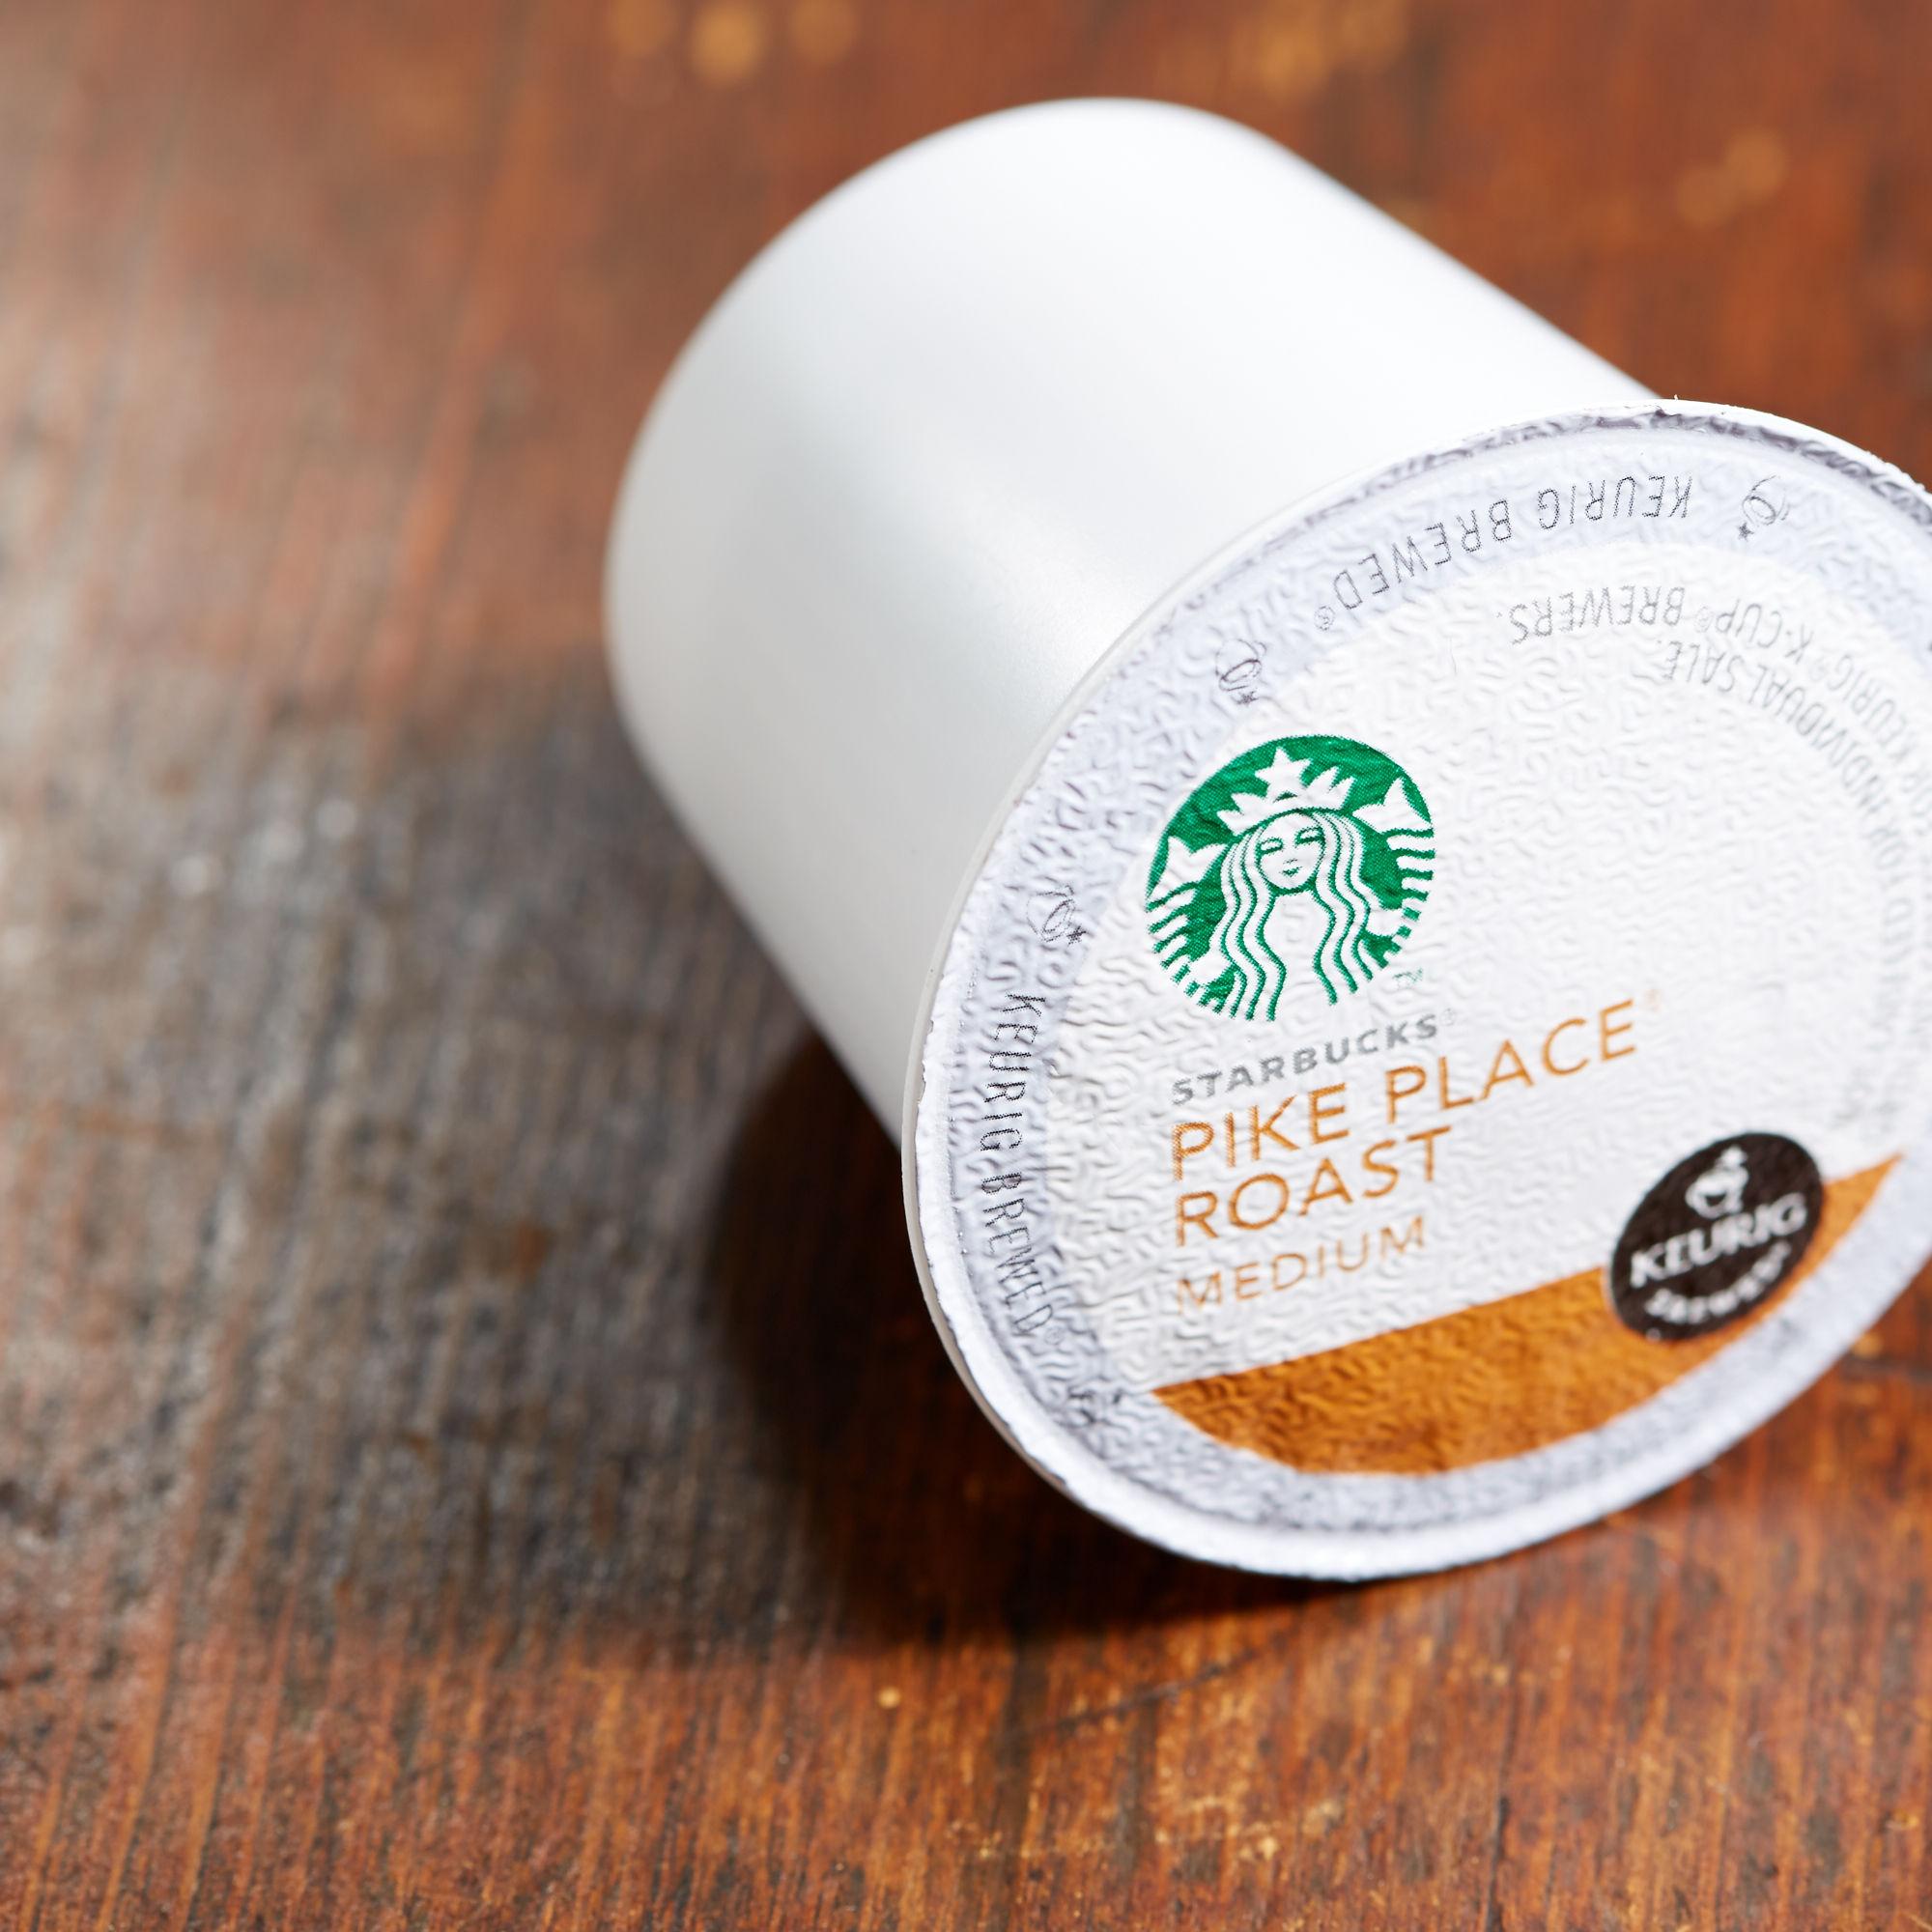 Starbucks K-Cup-星巴克 Pike Place 派克市场烘焙 K-Cup咖啡24杯